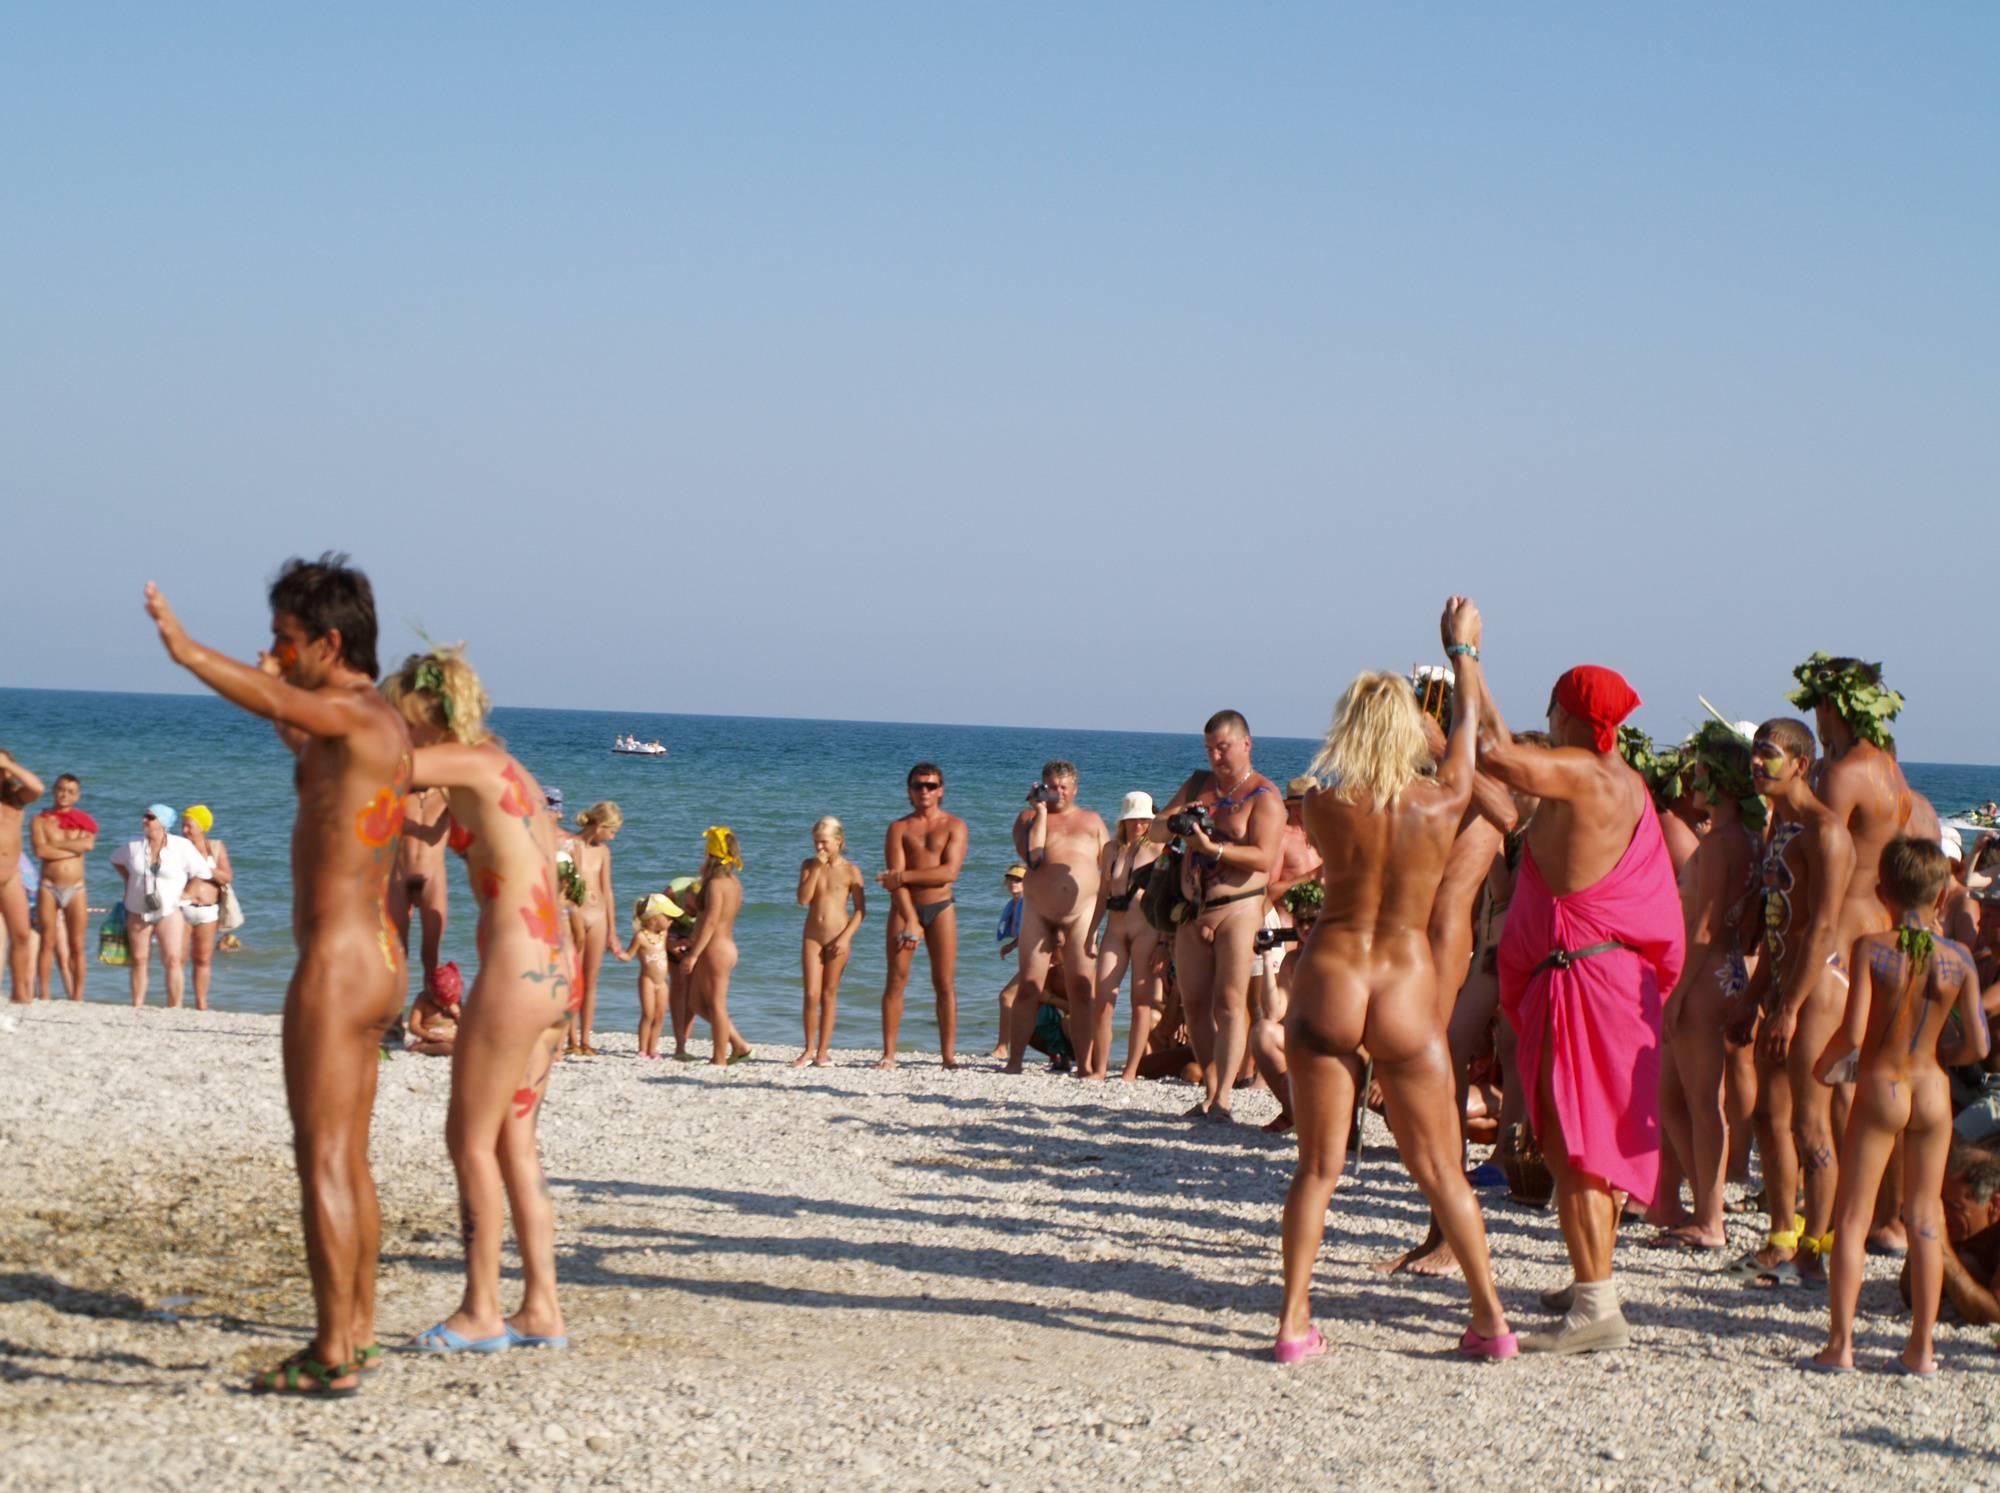 Nudist Beach Day Dancers - 2